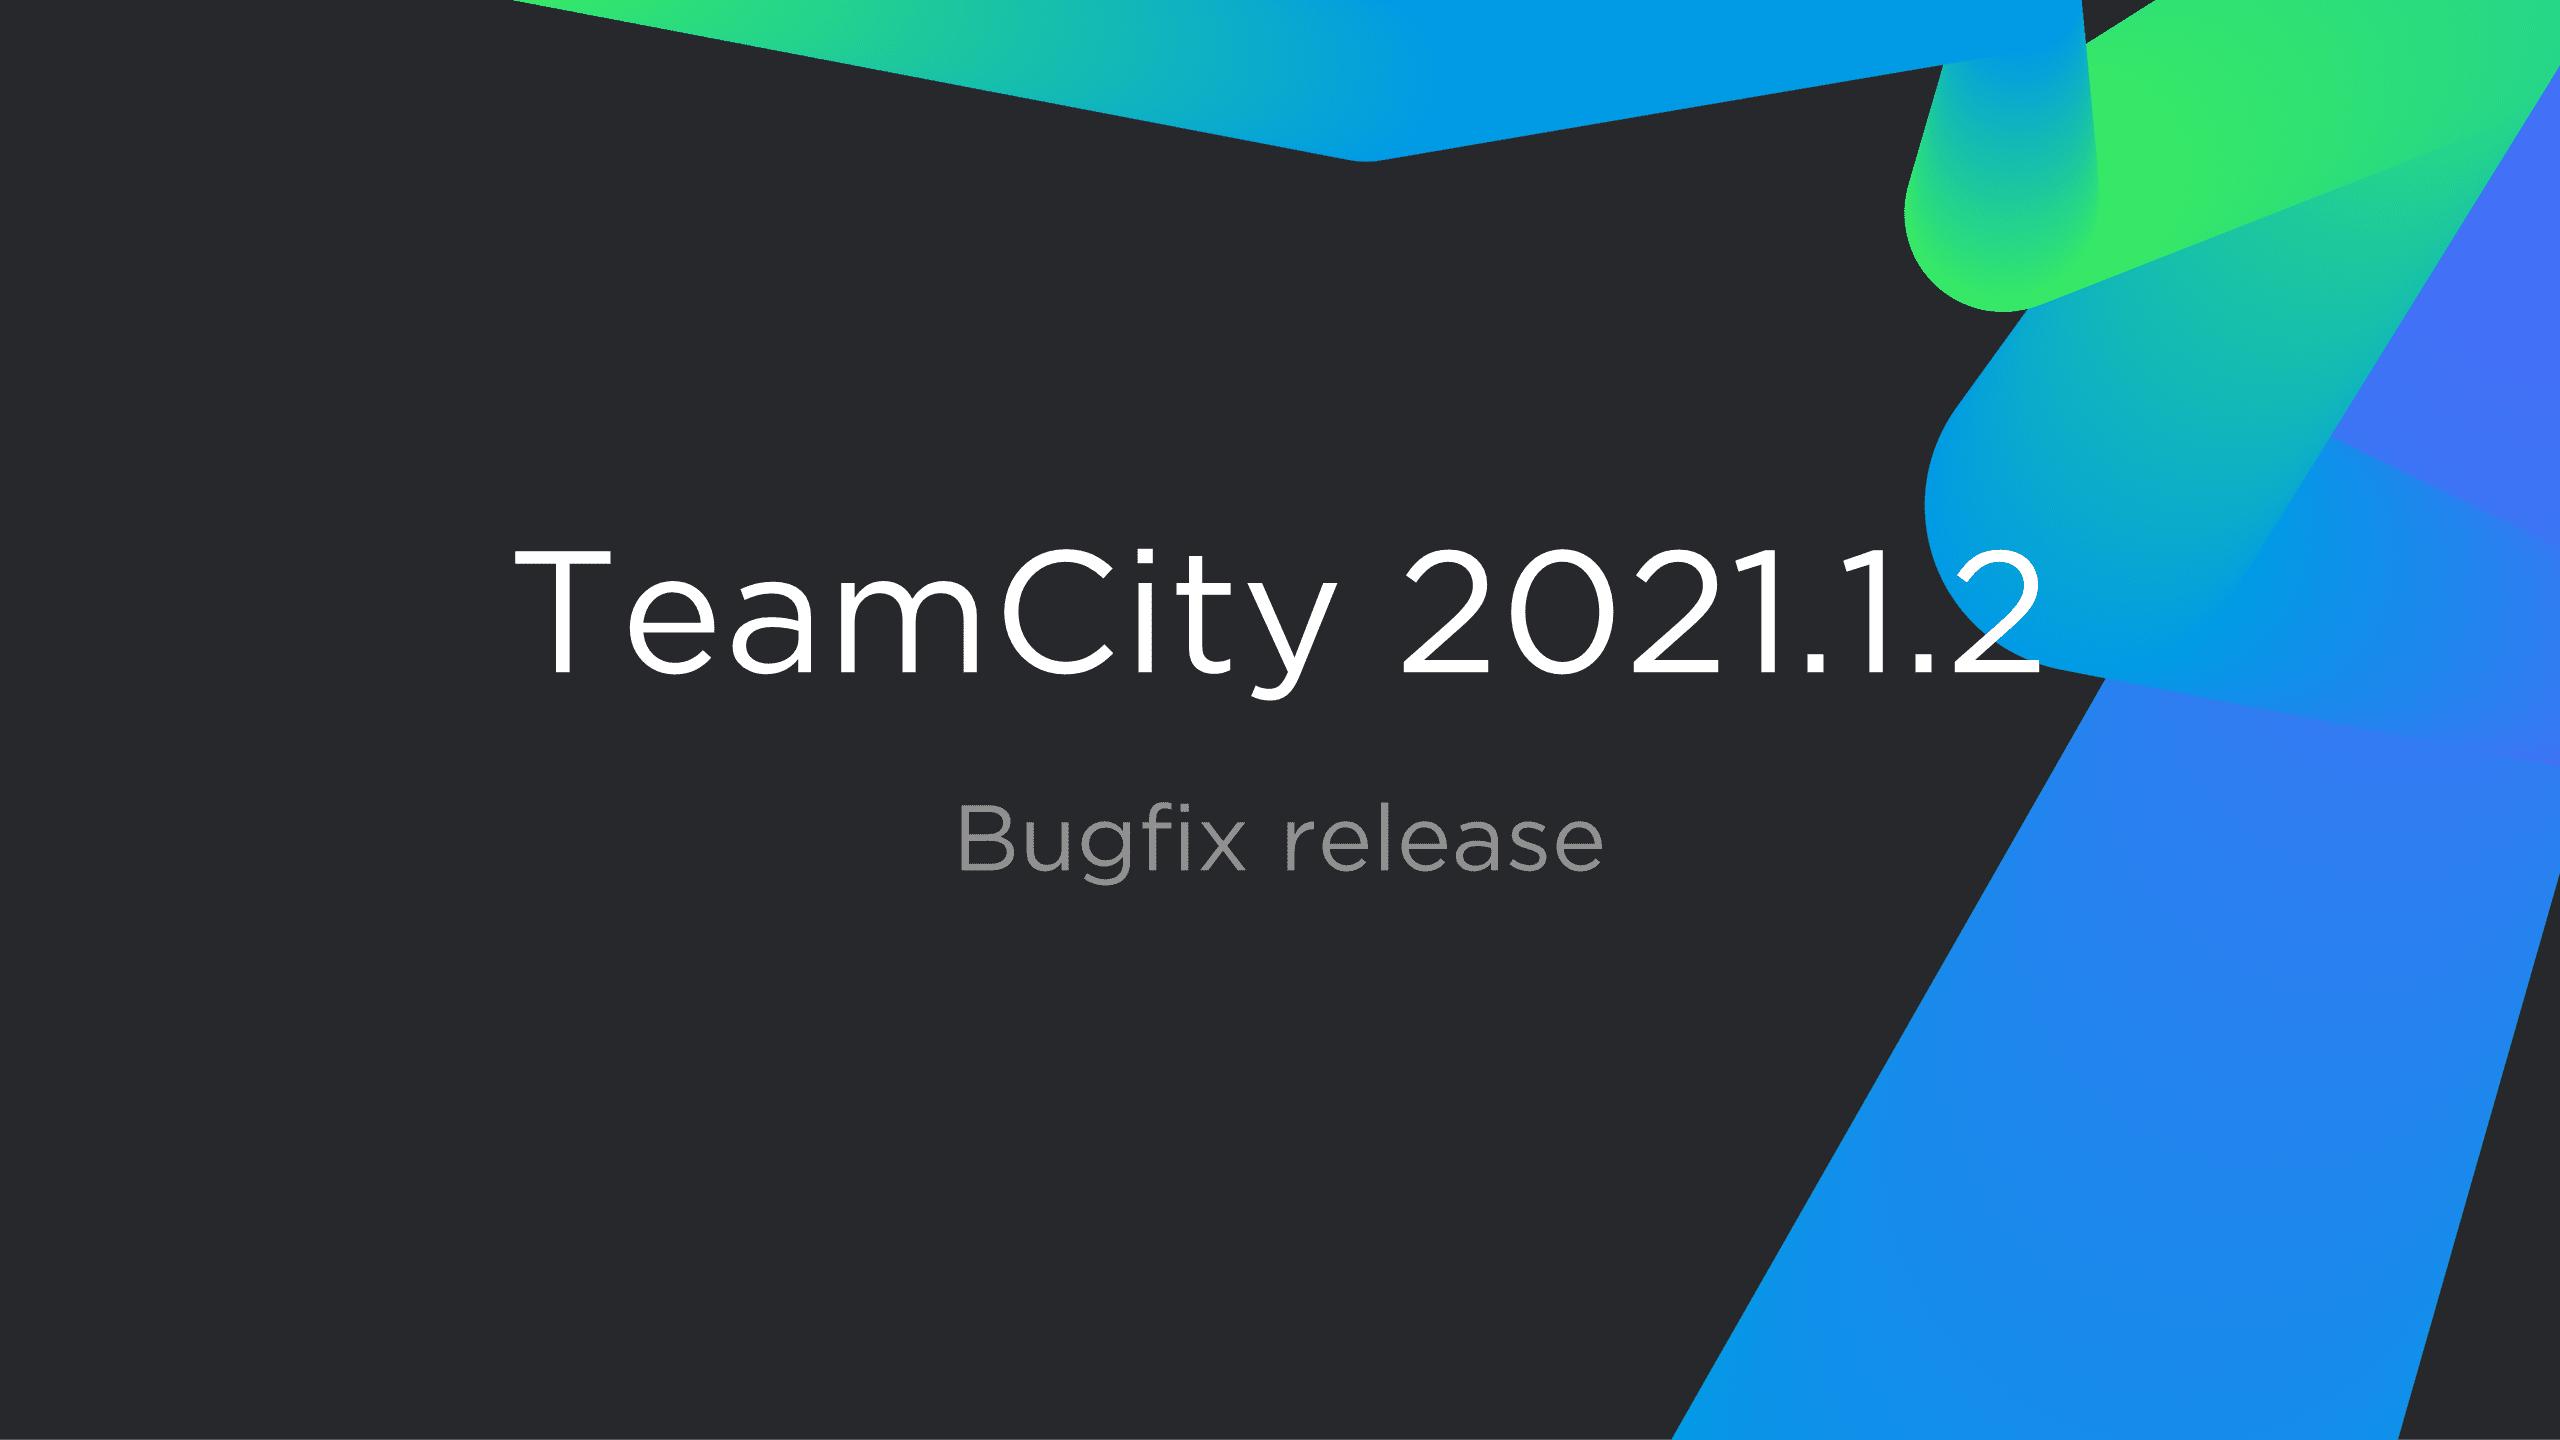 2021.1.2